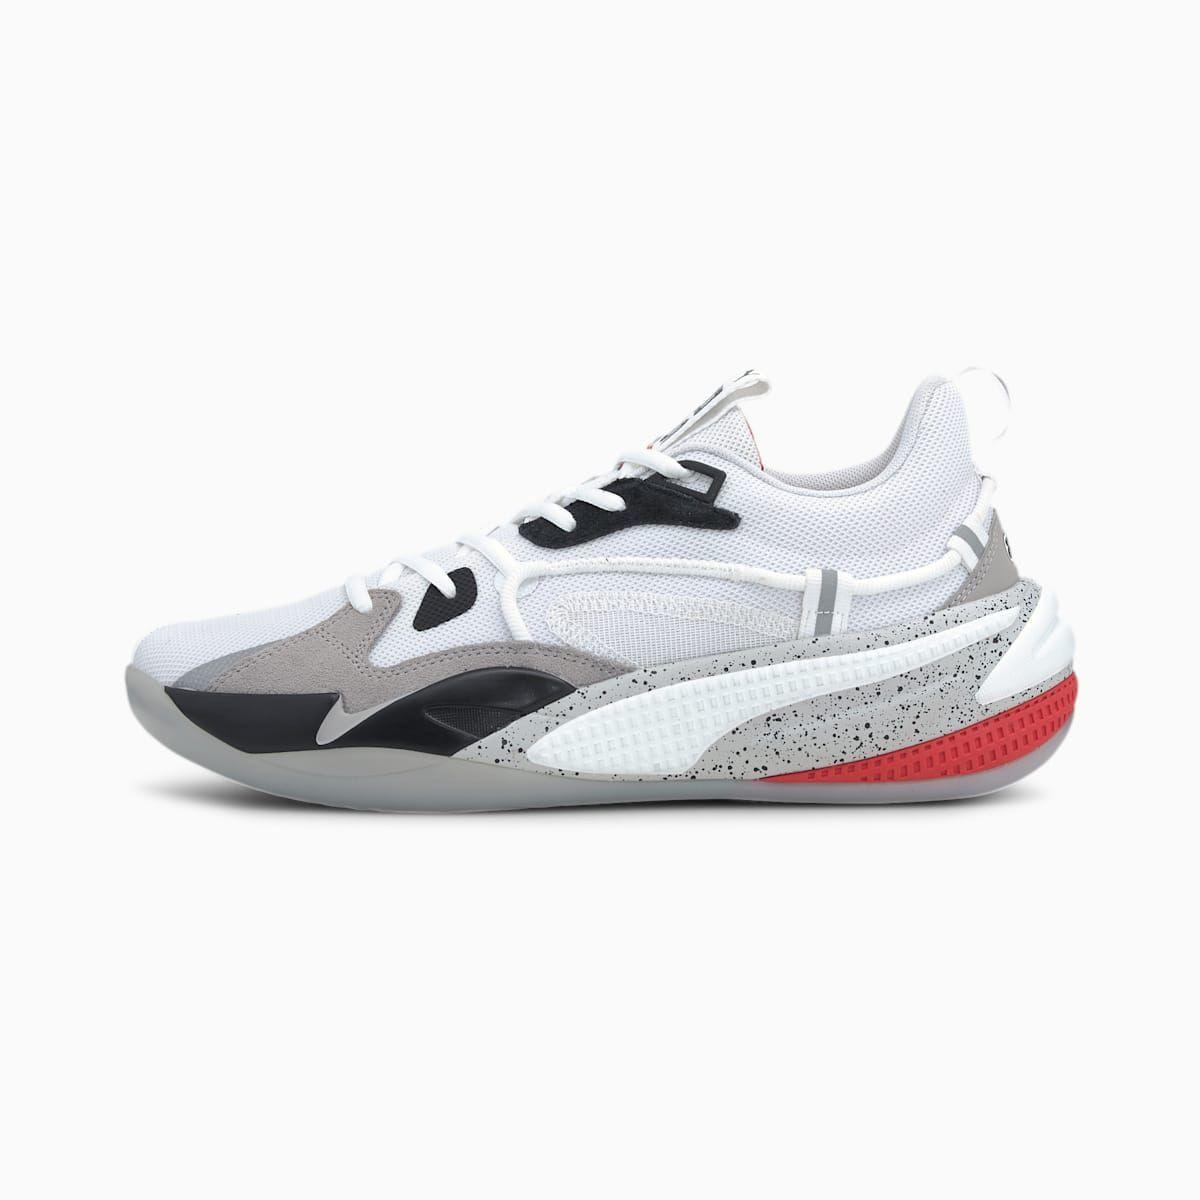 Youth basketball shoes, Puma